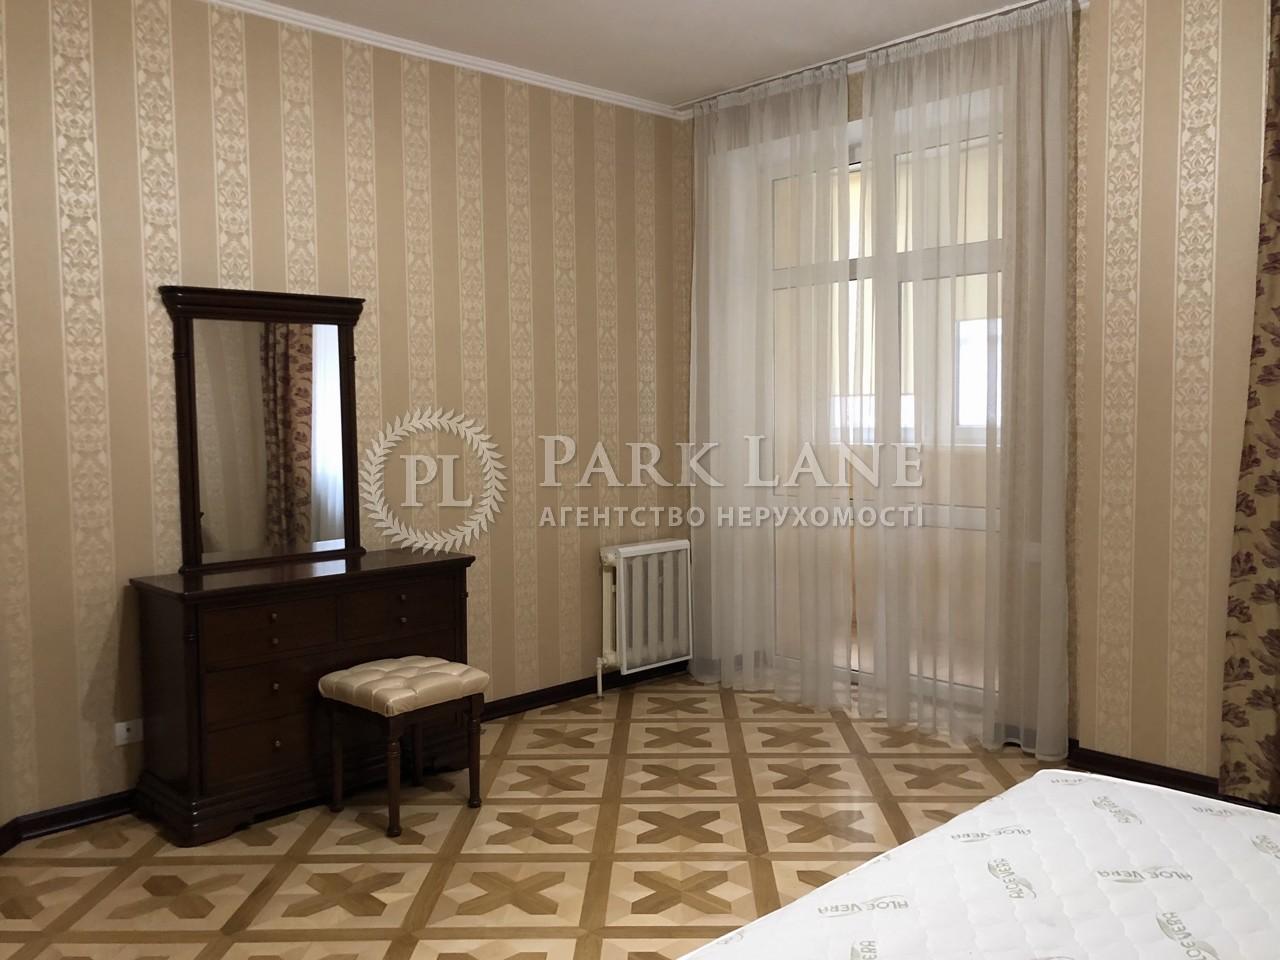 Квартира ул. Павловская, 26/41, Киев, Z-479033 - Фото 7